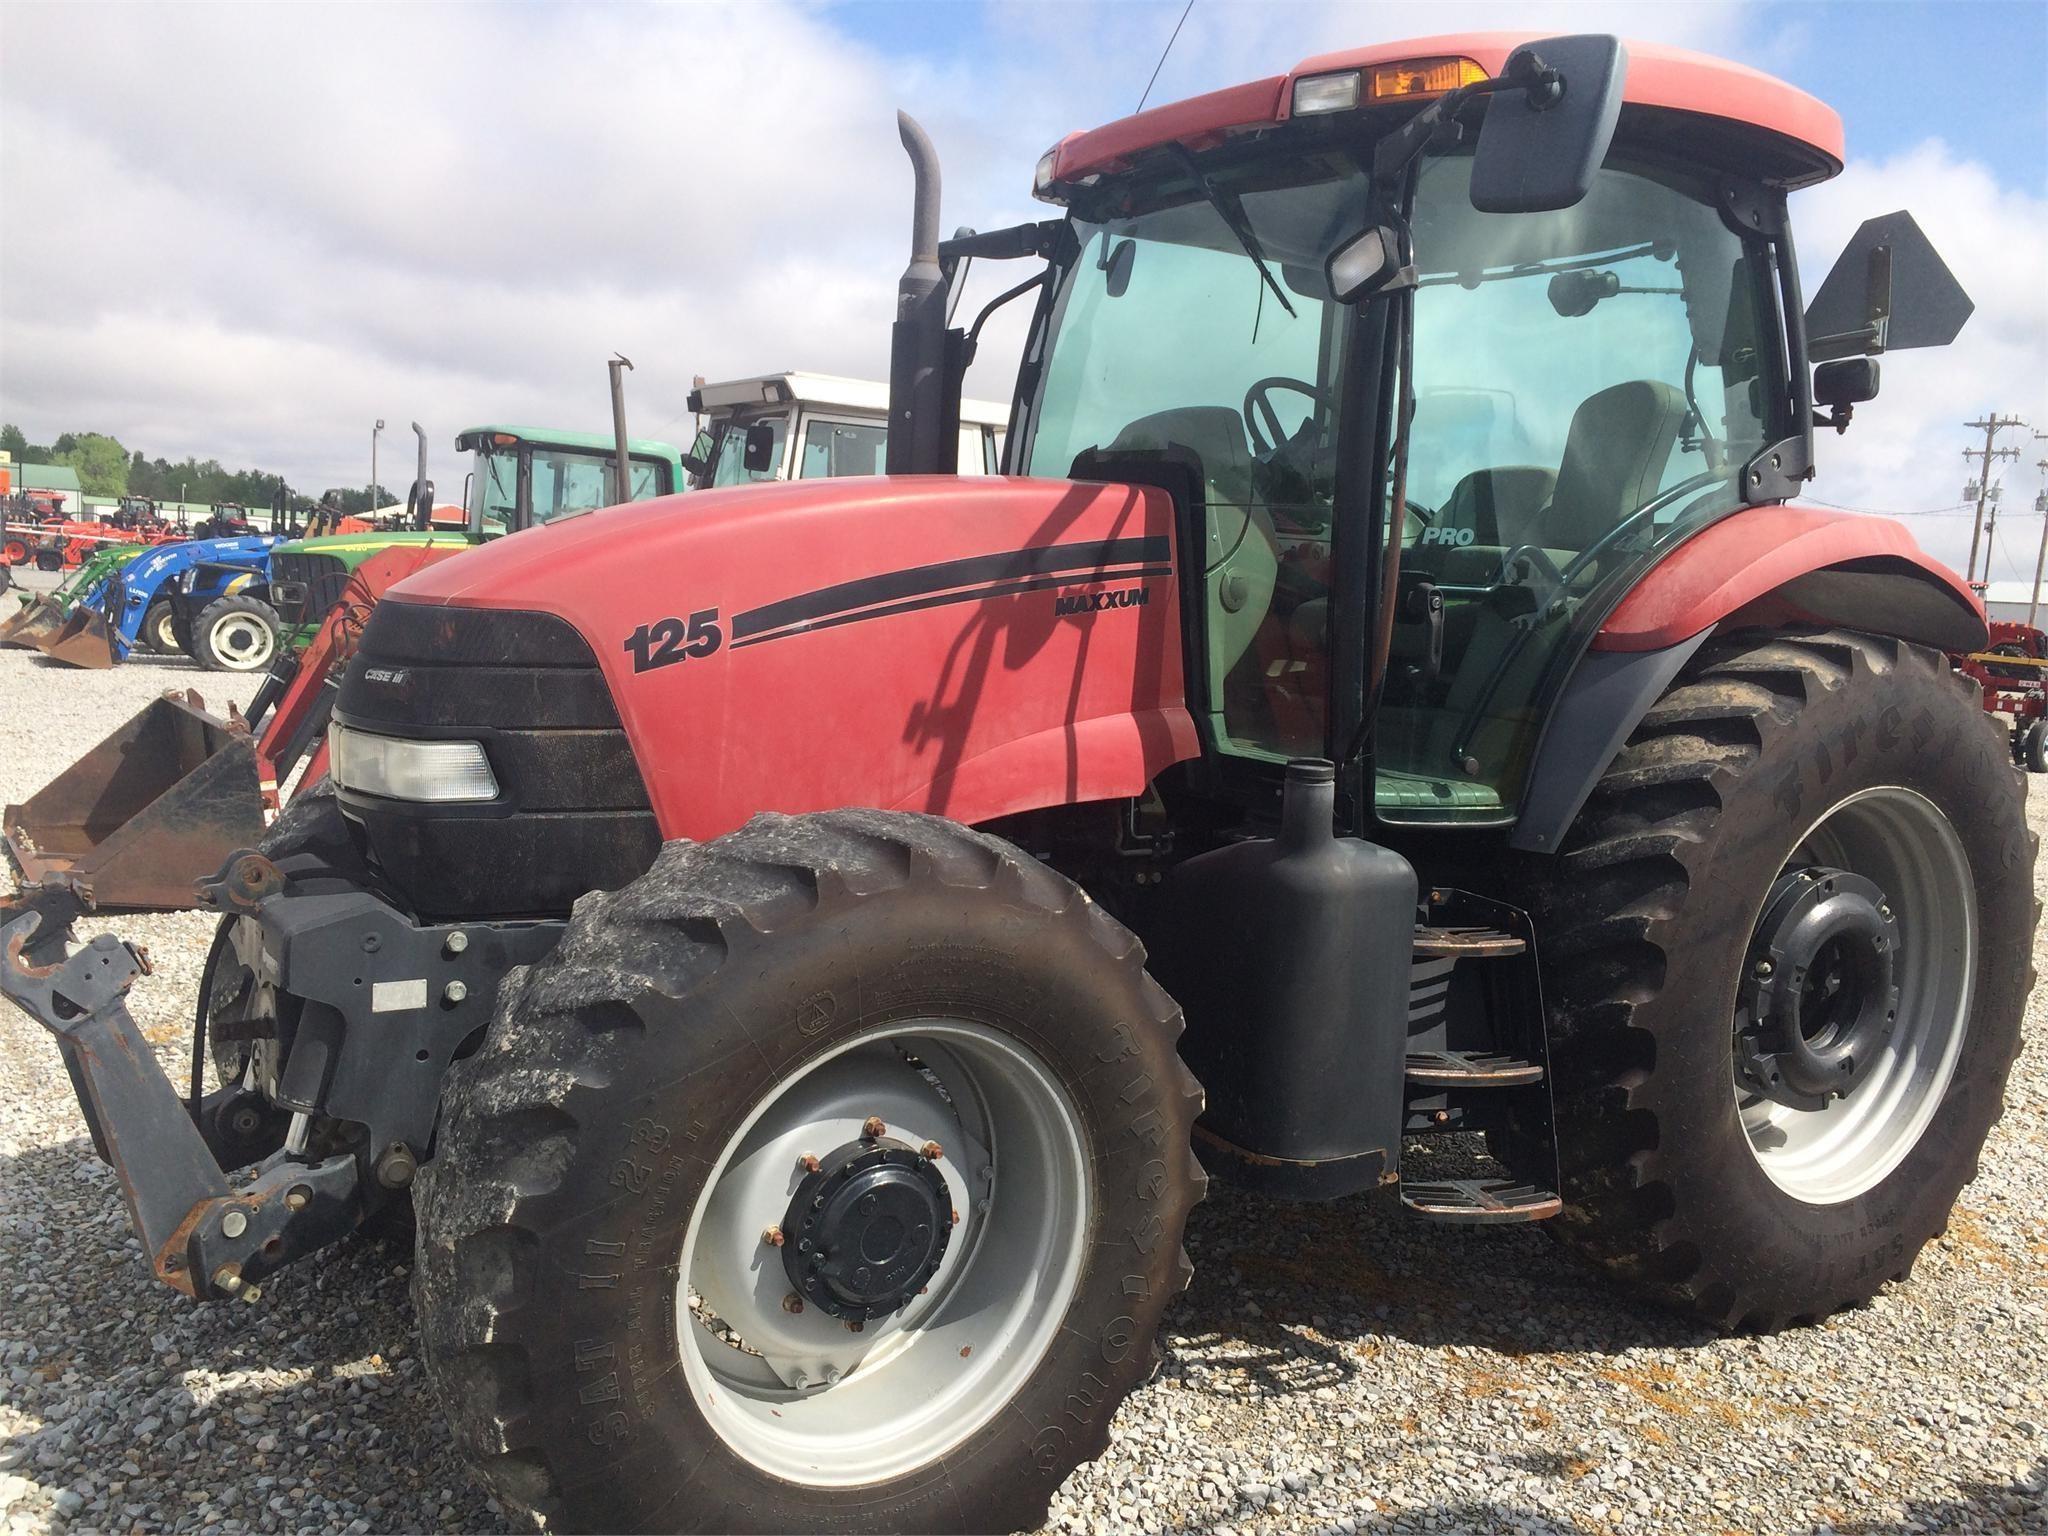 2009 Case IH Maxxum 125 Tractor